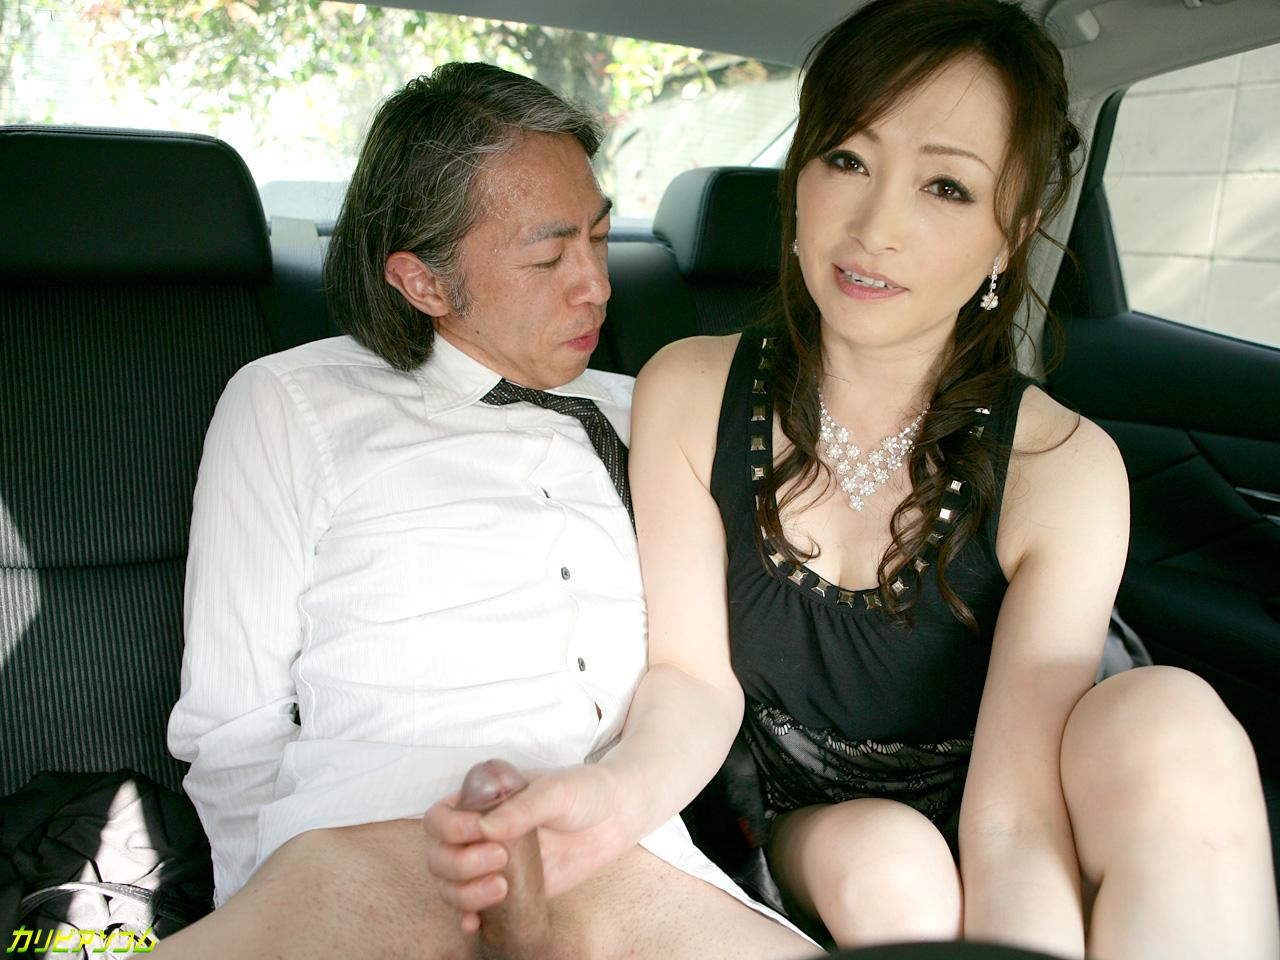 極上セレブ婦人 Vol.4 前編 美山蘭子